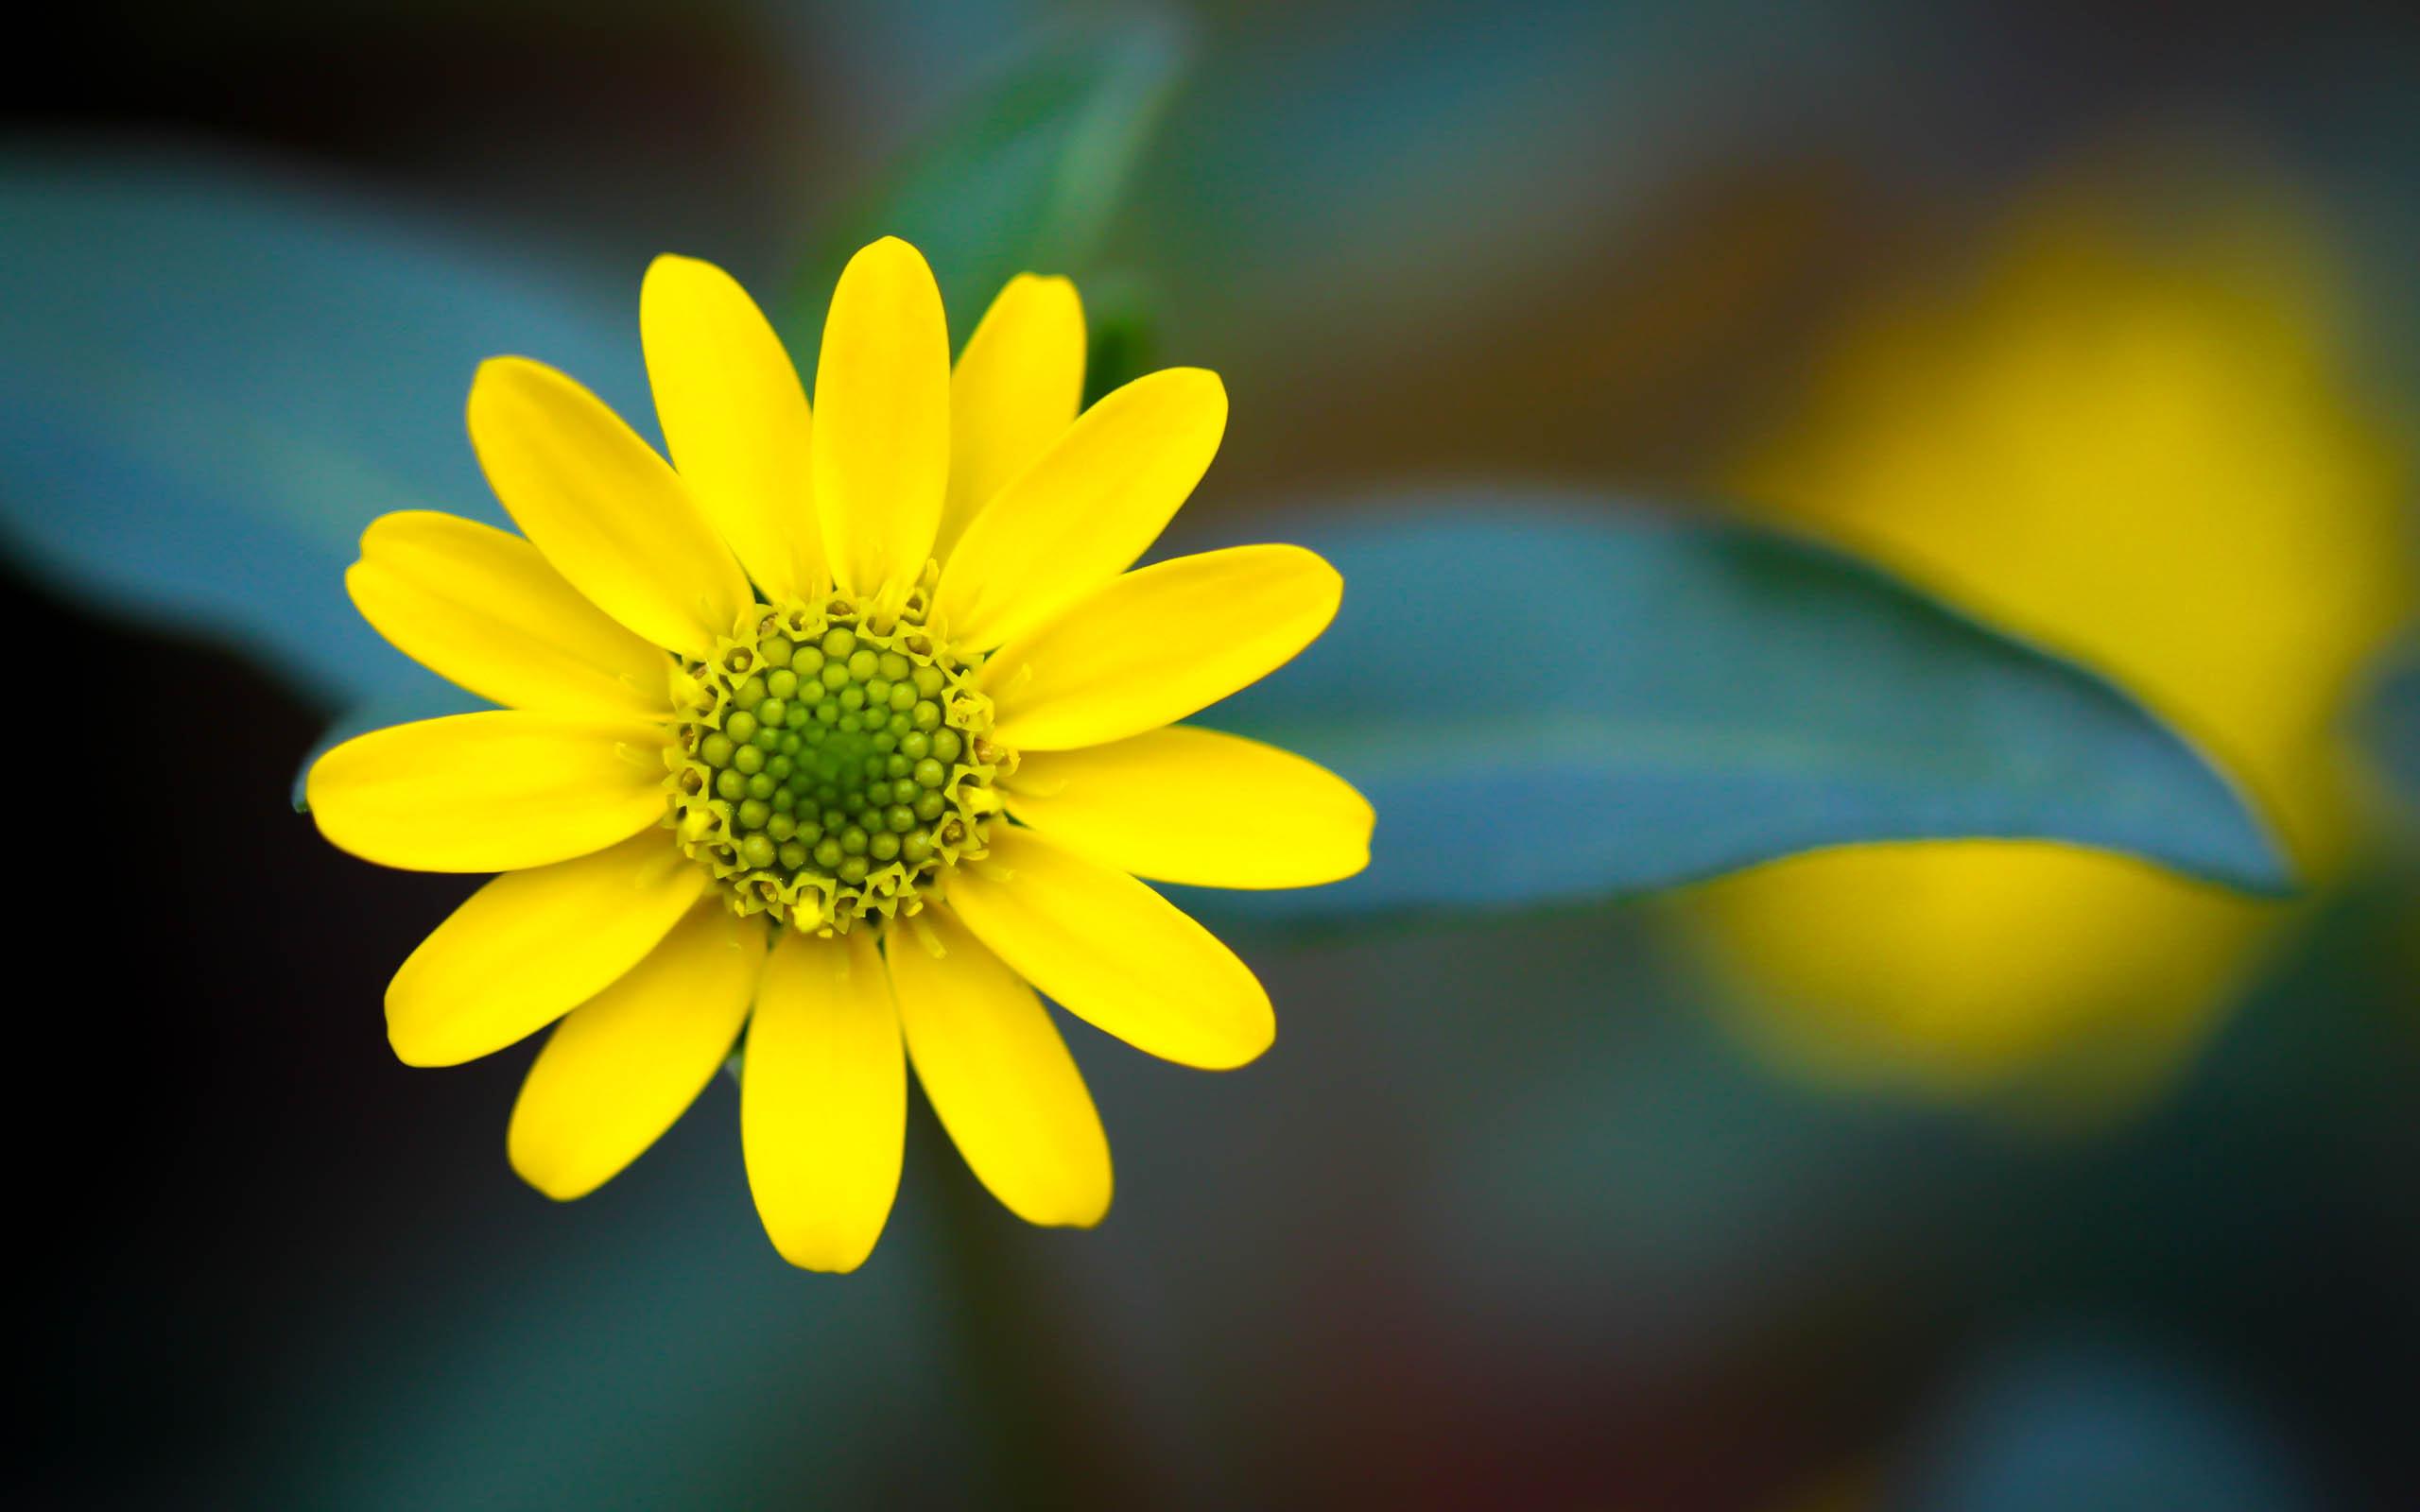 Hd wallpaper yellow flowers - Macro Flowers Hd Yellow